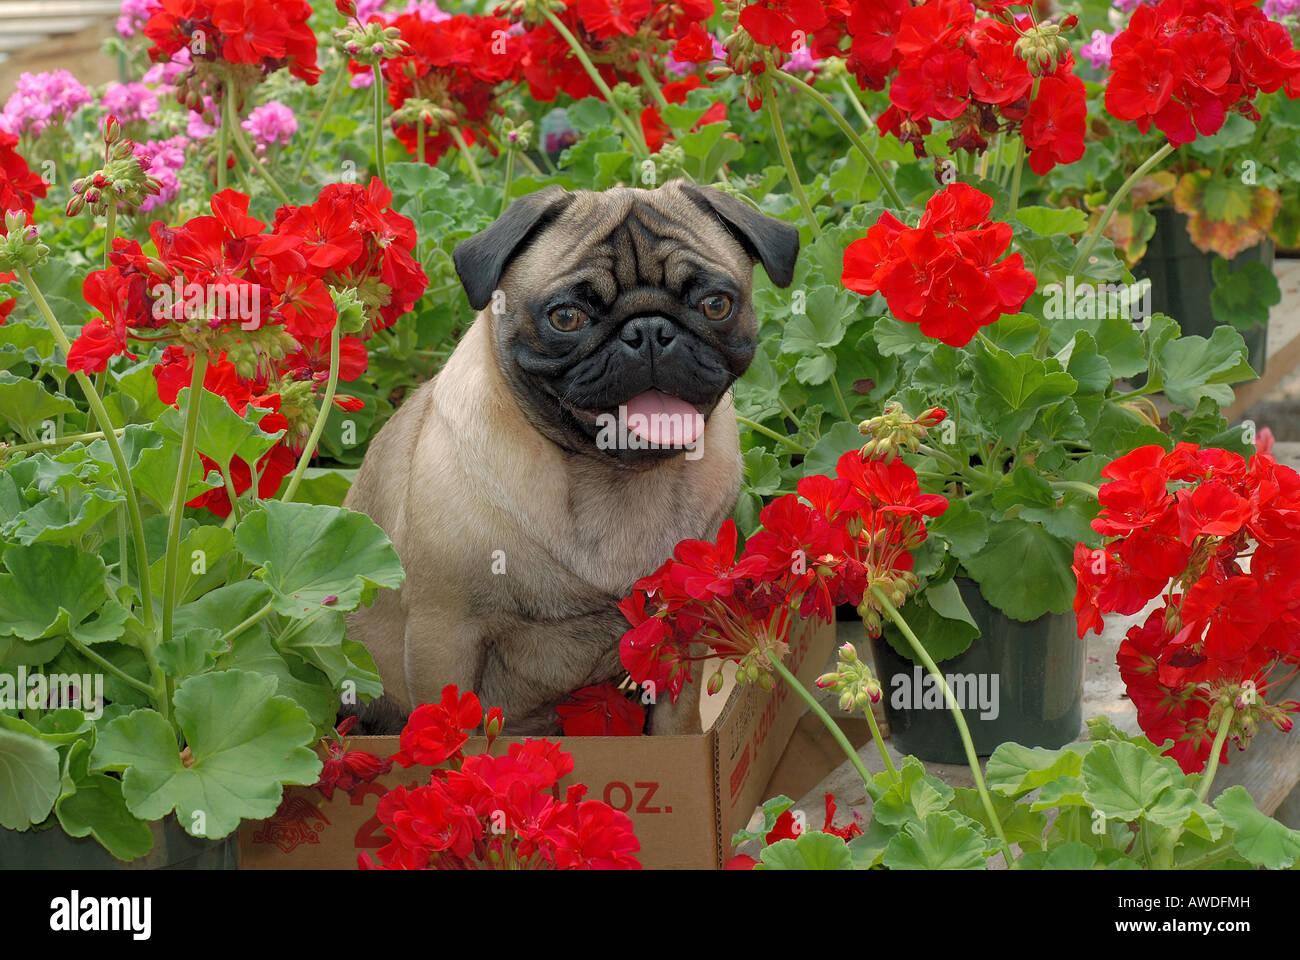 Pug dog in garden - Stock Image